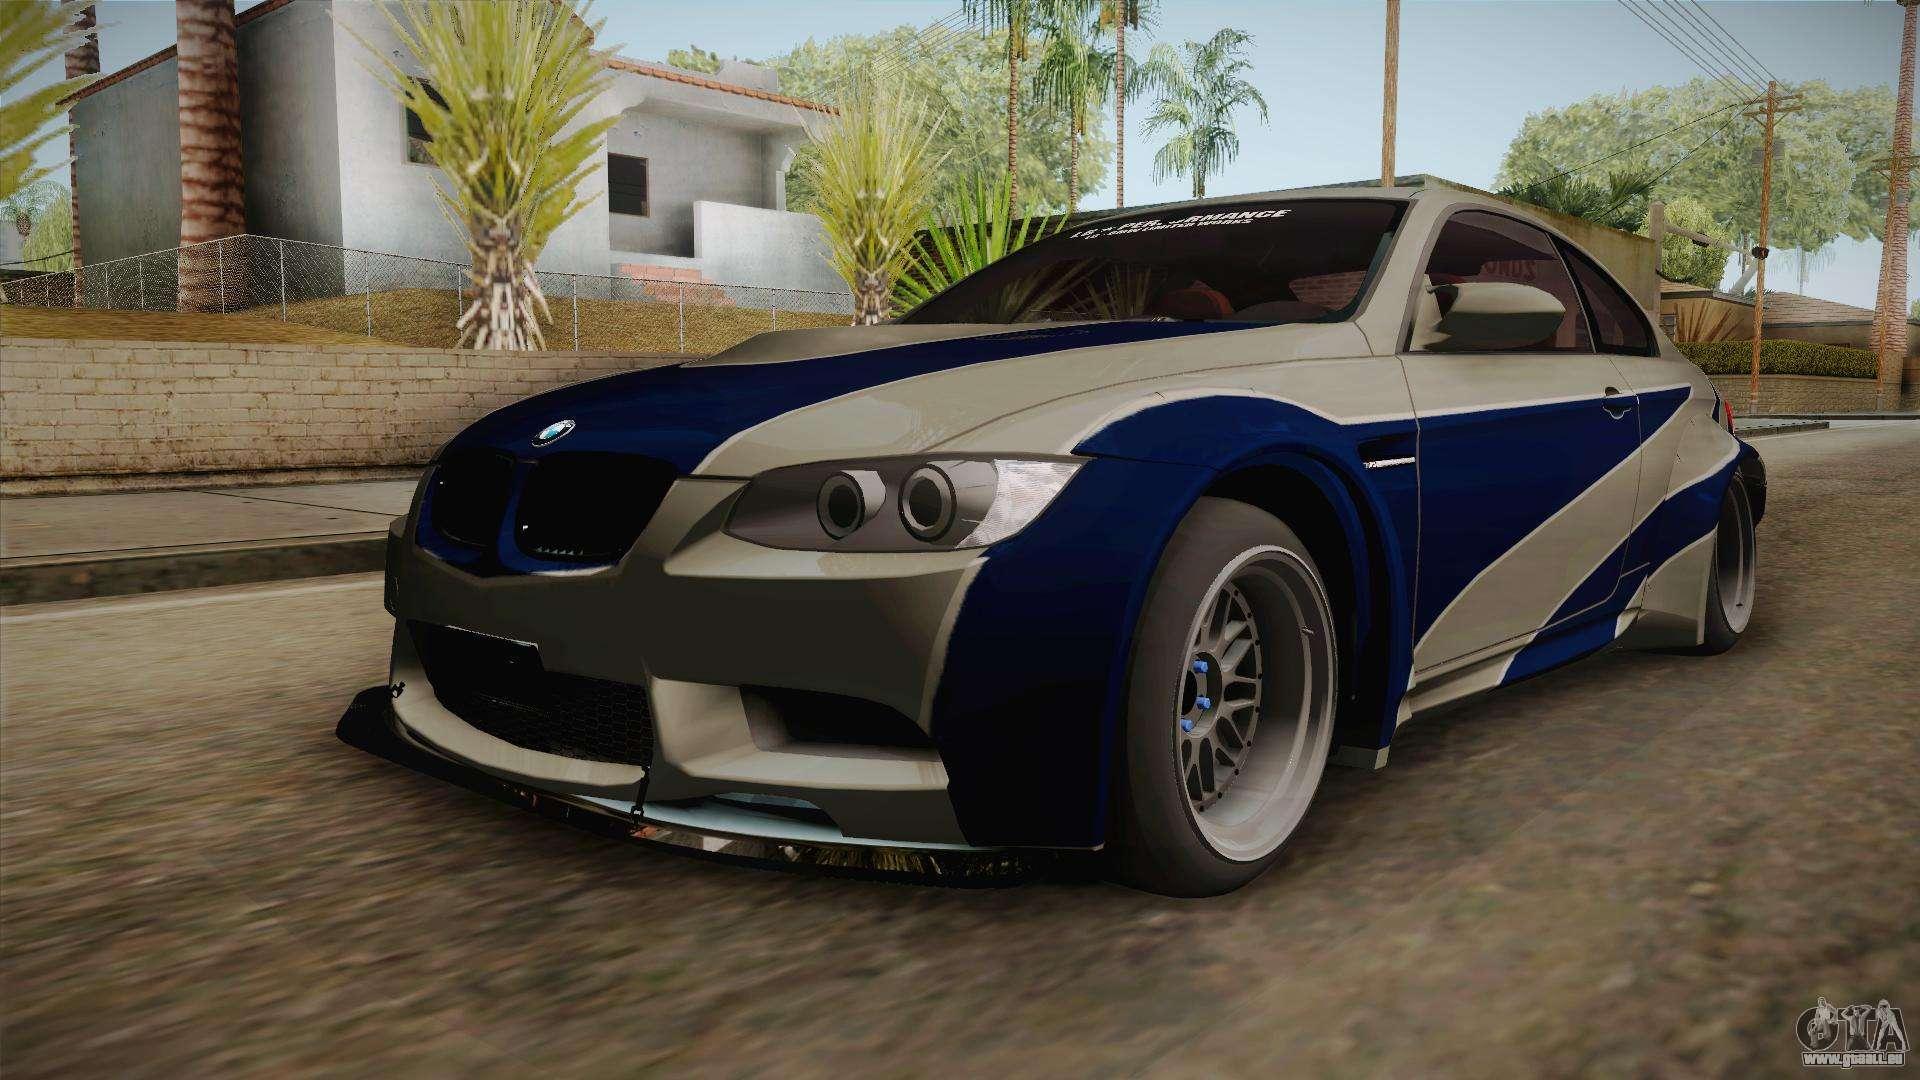 440+ Mod Mobil Most Wanted Gta Sa Gratis